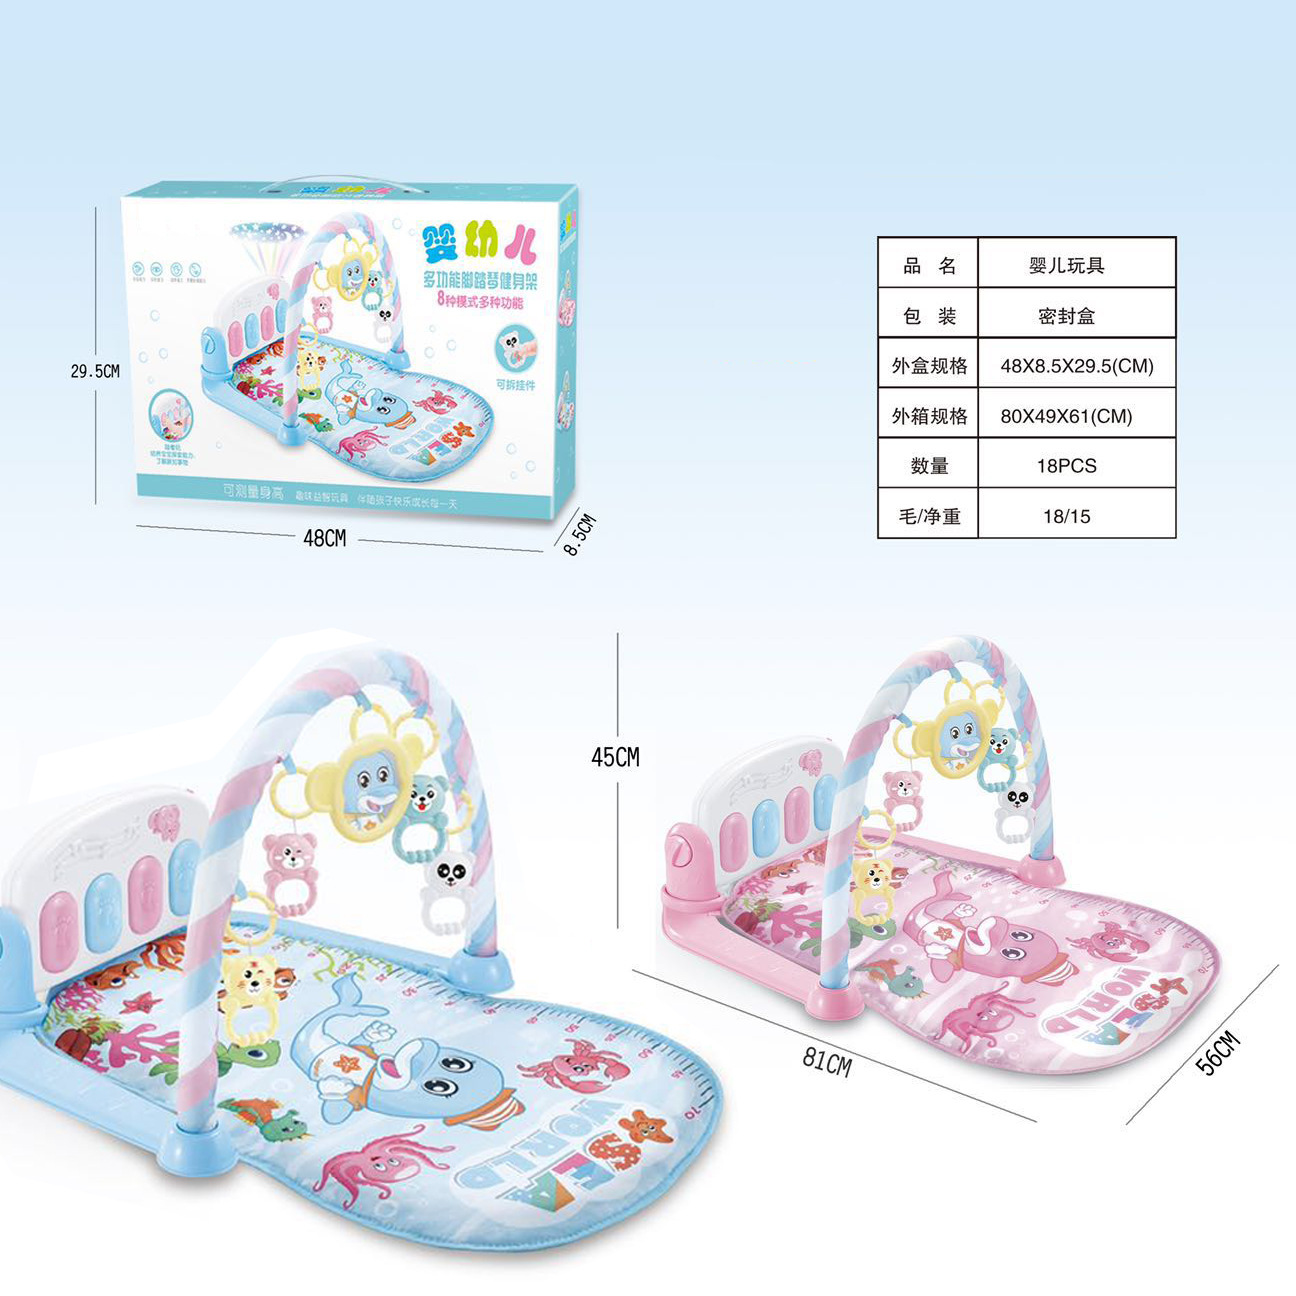 Infant Large Size Harmonium Fitness Rack Infants Music Piano Toys Newborns Baby Game Blanket Rattle